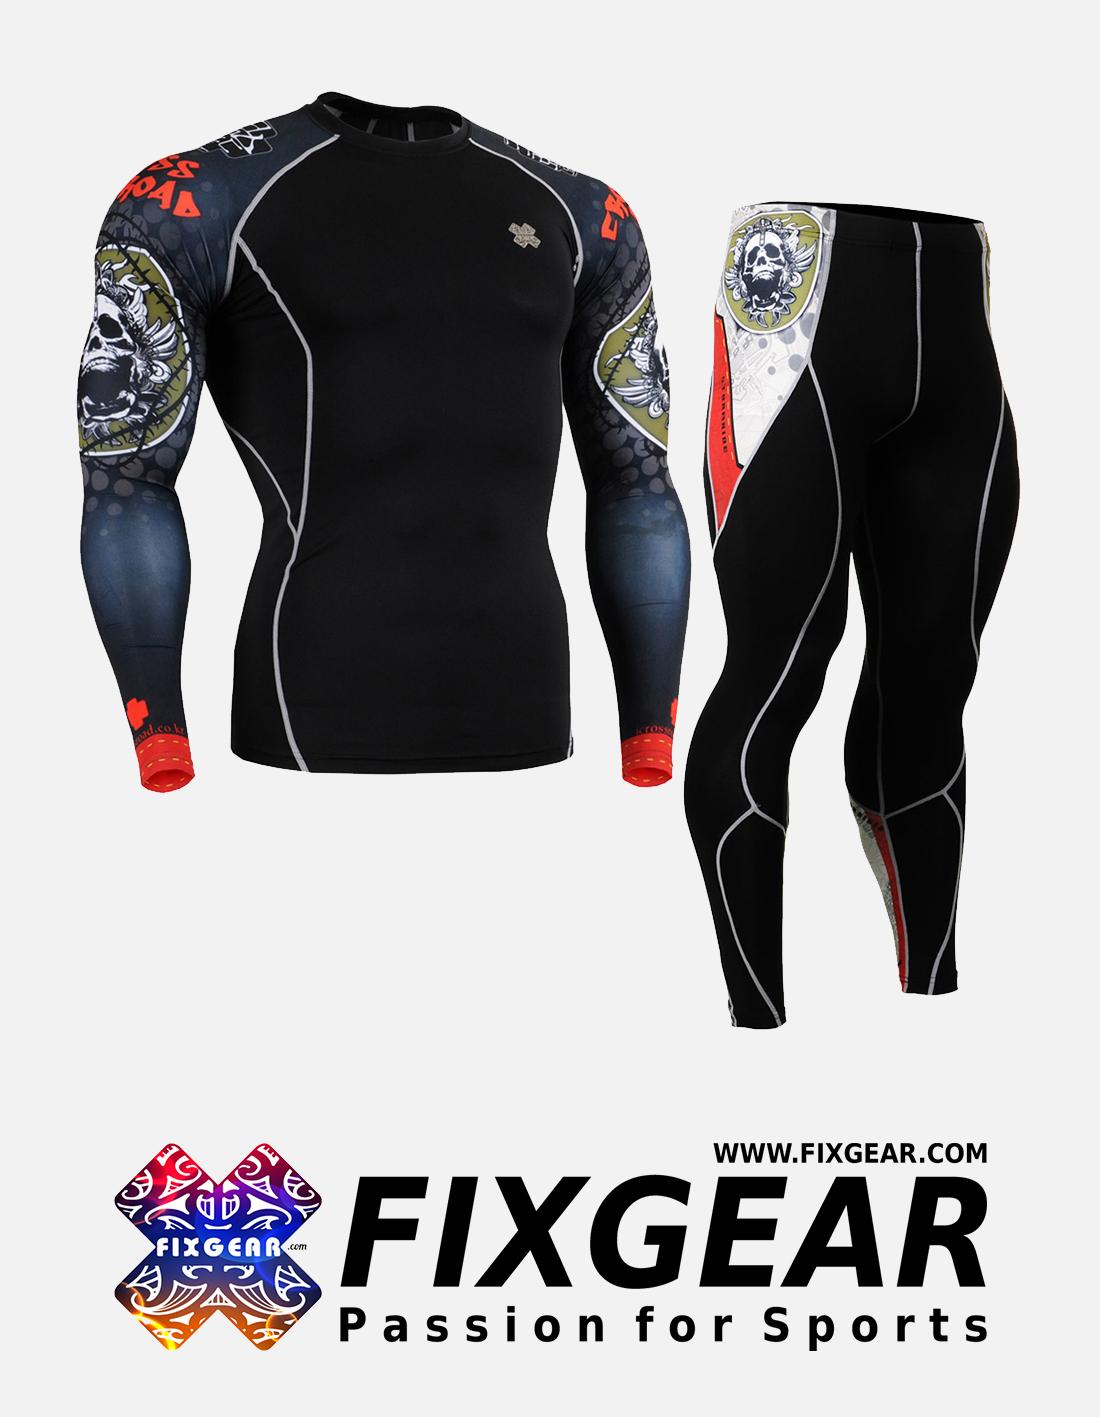 FIXGEAR CPD-P2L-B5 Set Compression Base Layer Shirt & Legging Pants